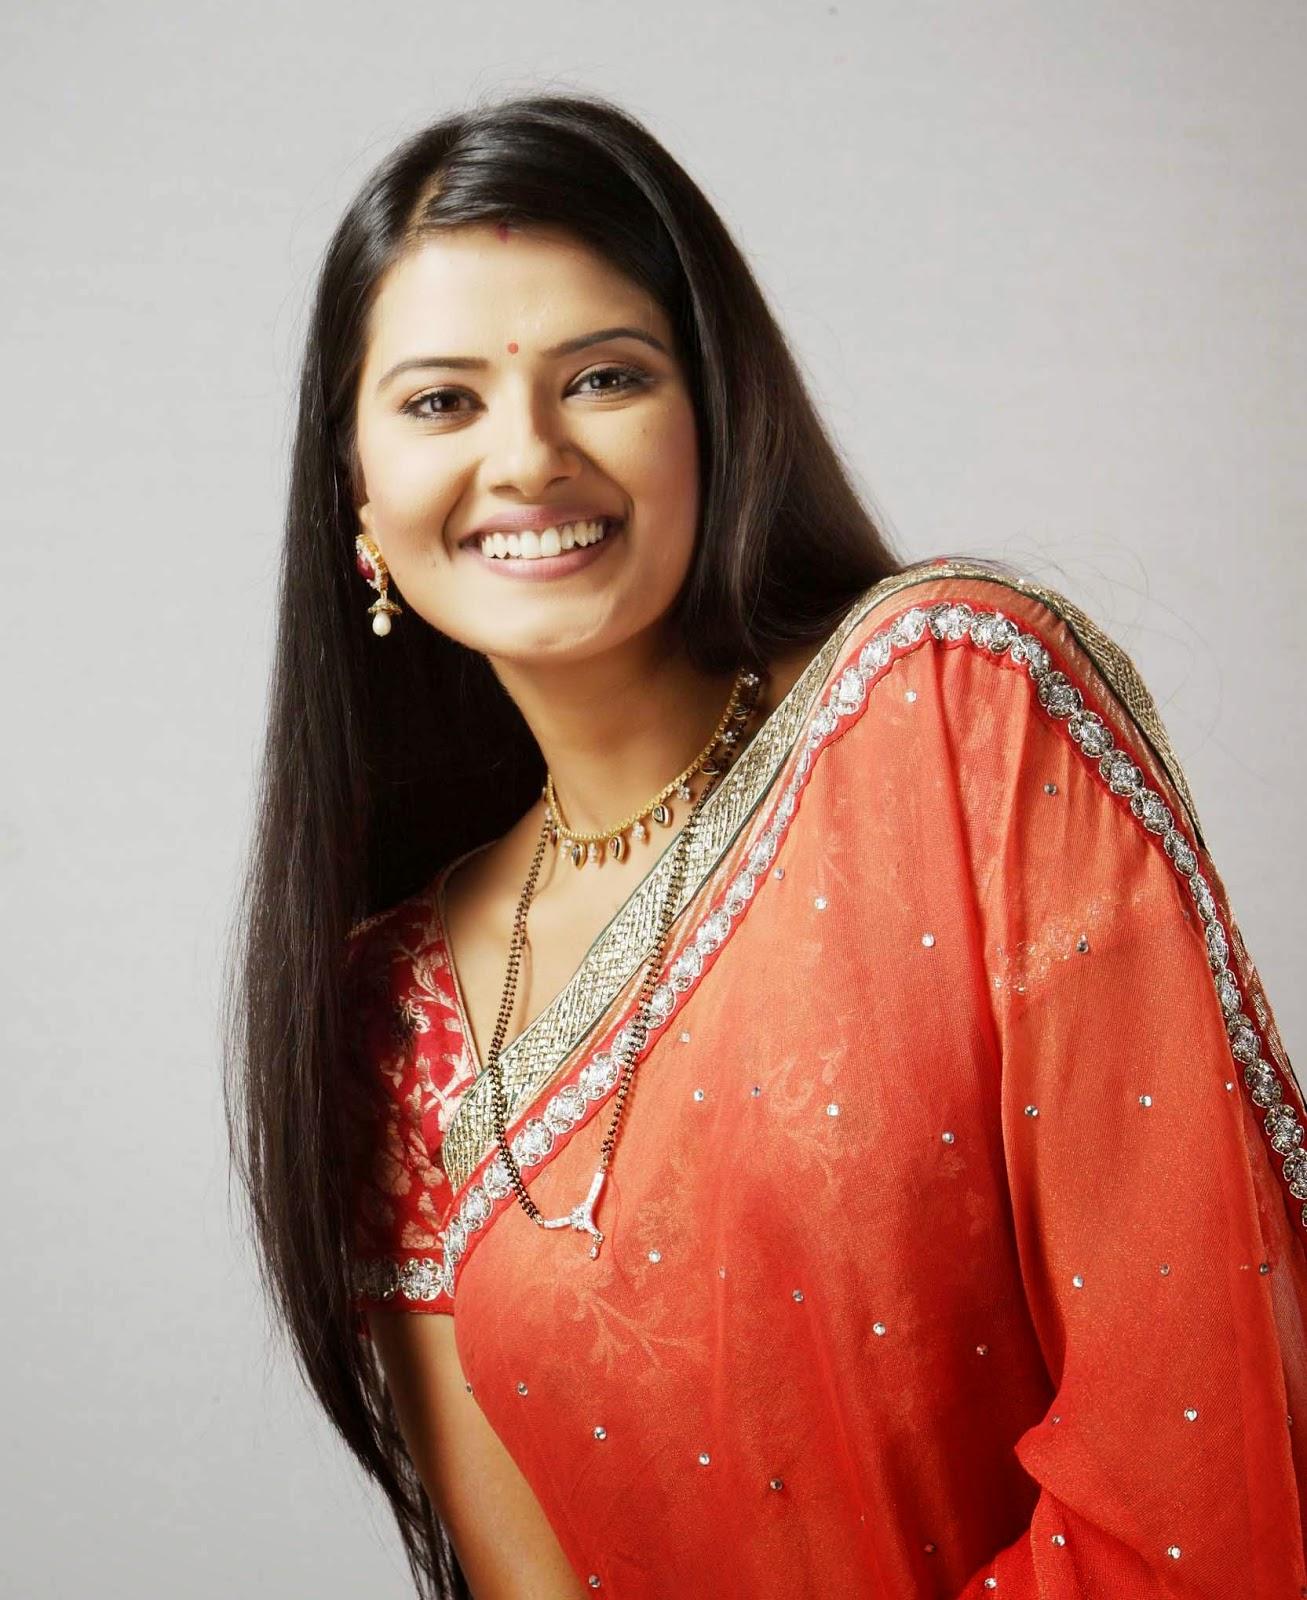 Watch Kratika Sengar 2007 video